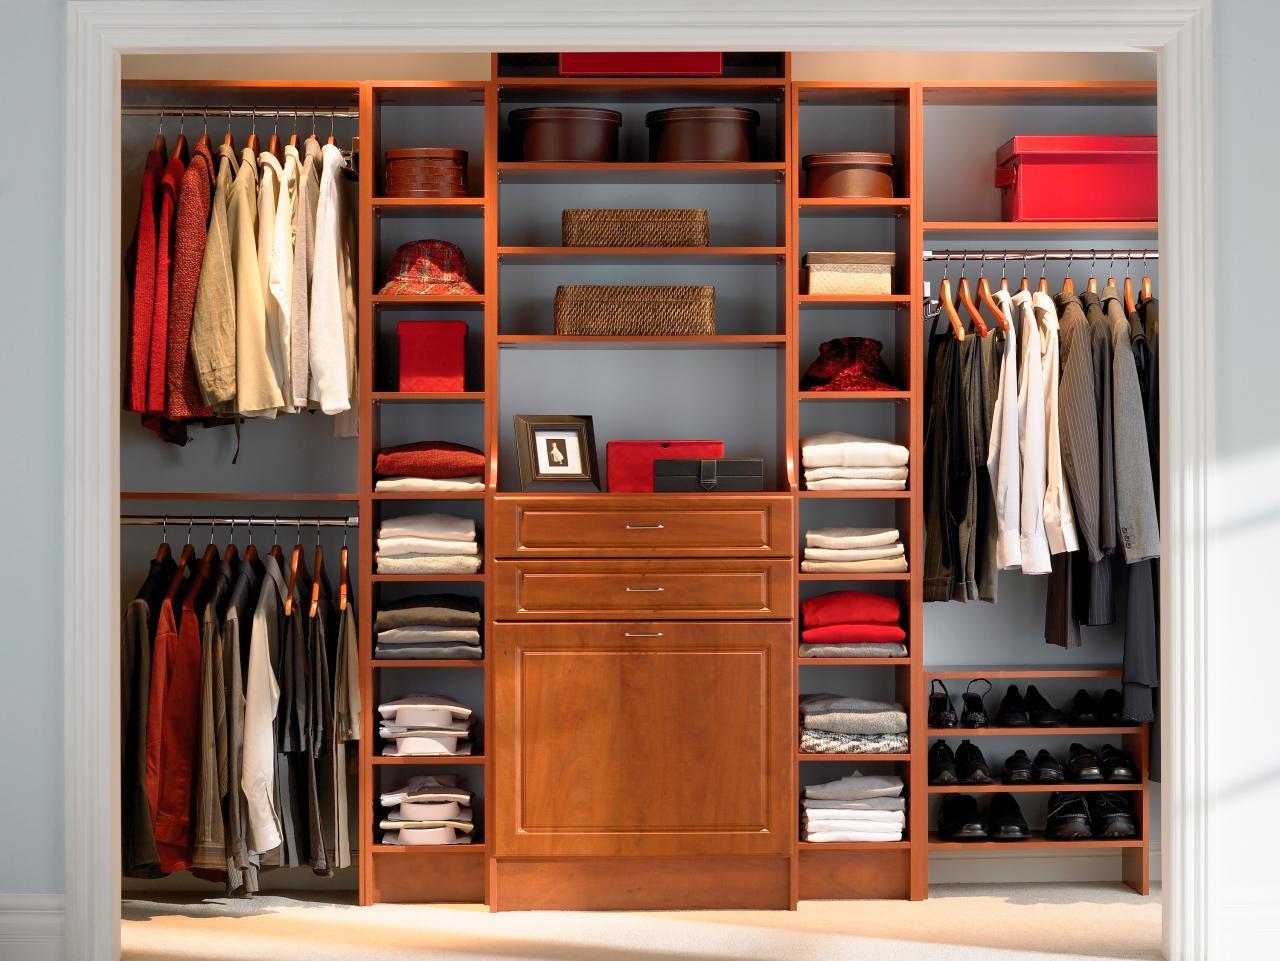 Cabinet systems Main cabinet in warm colors JCEZANQ